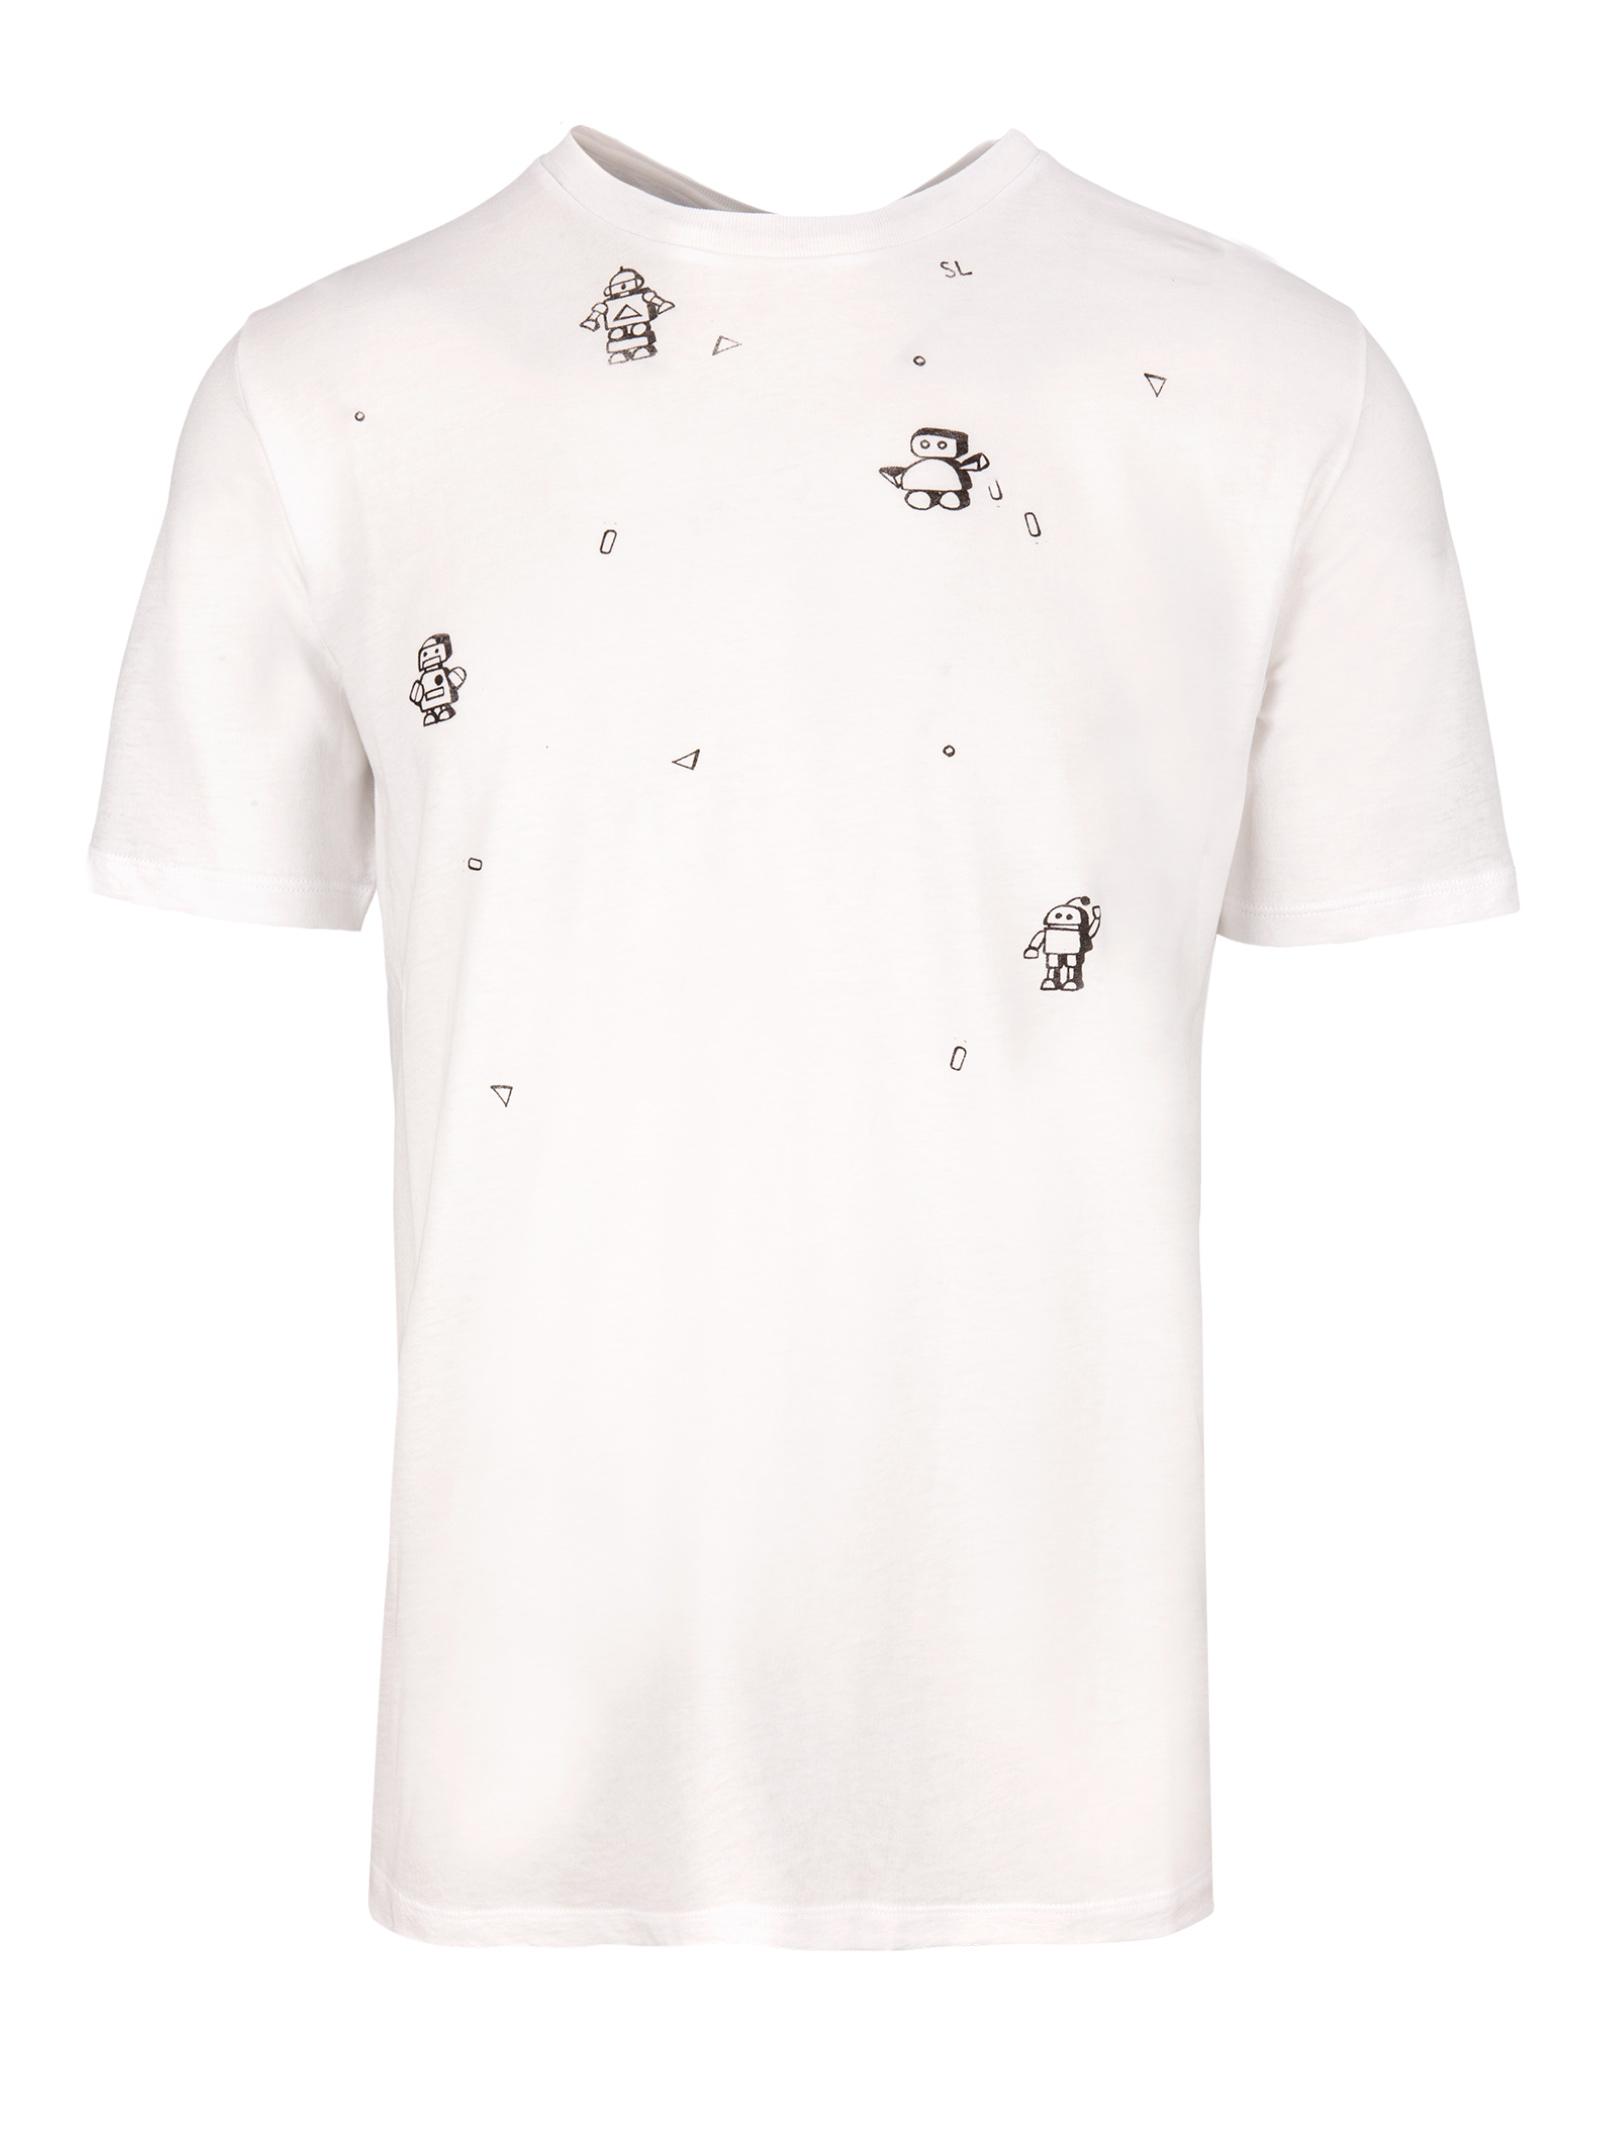 T-Shirt Saint Laurent - Saint Laurent - Michele Franzese Moda 3dd13b7c06c